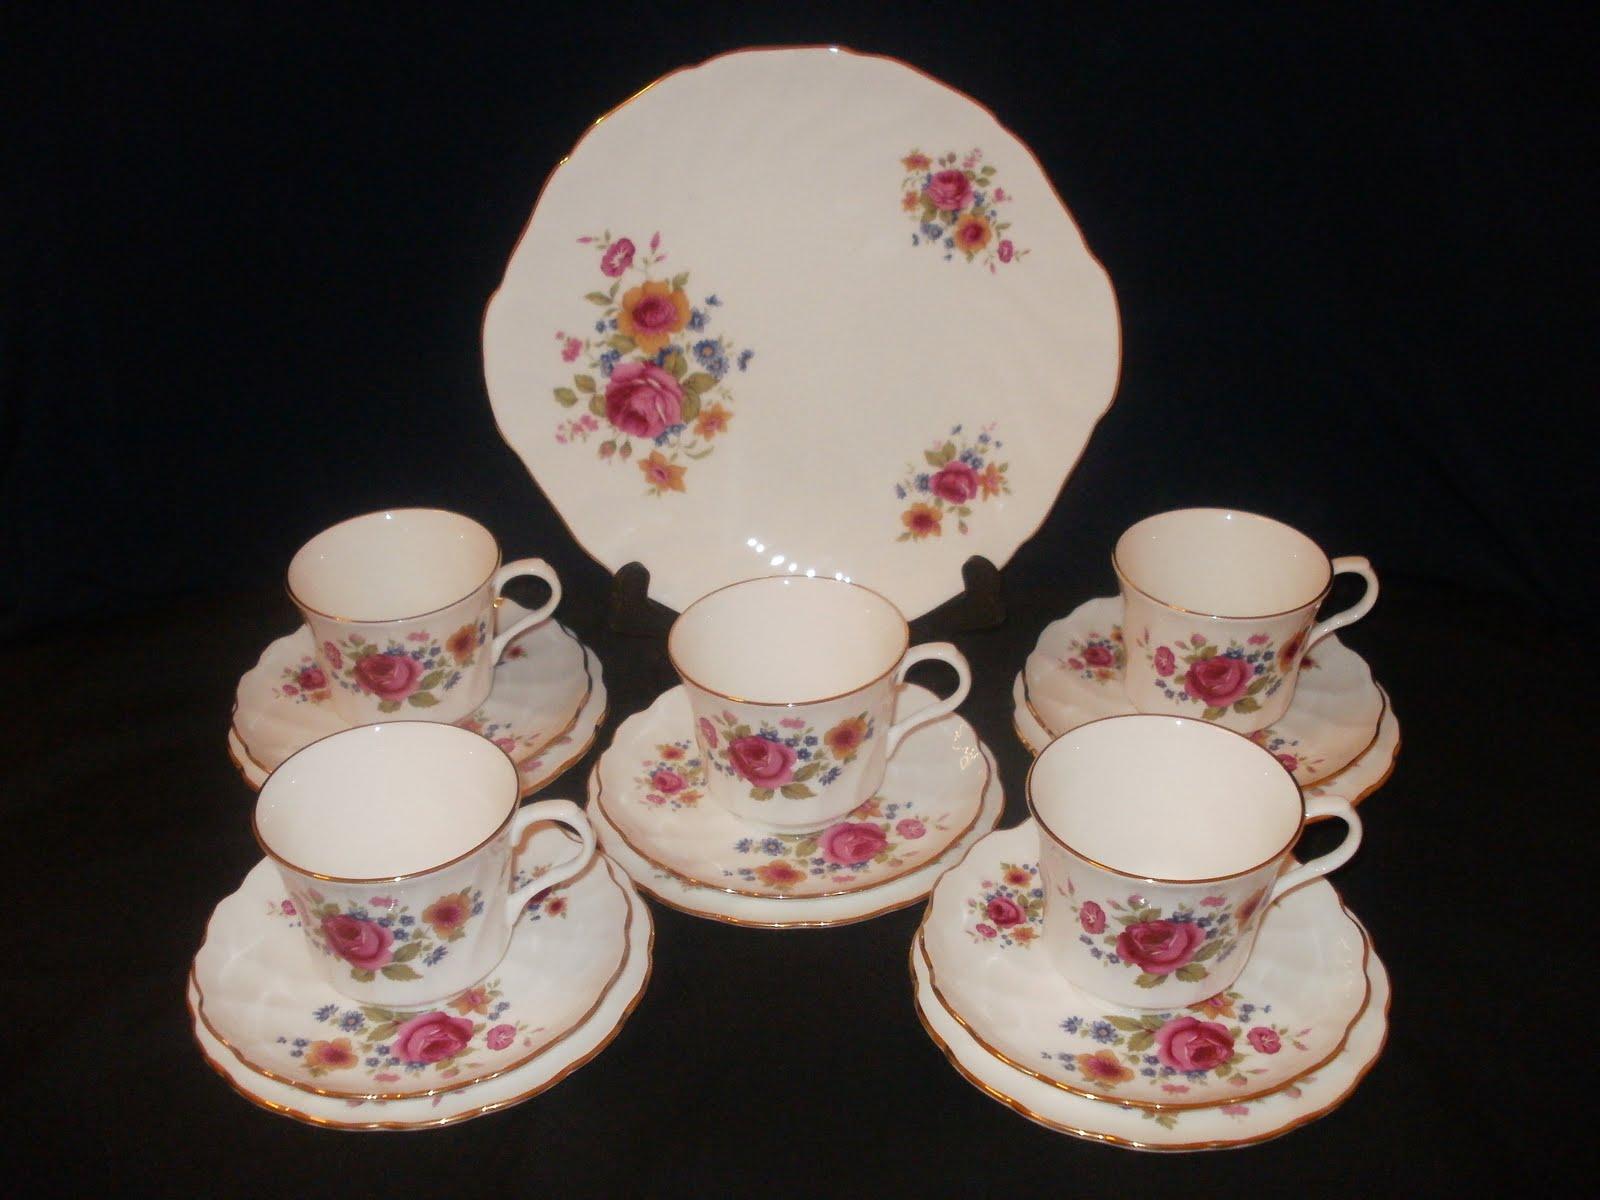 vintage teaware collectibles royal victoria english fine bone china summer rose reserved. Black Bedroom Furniture Sets. Home Design Ideas